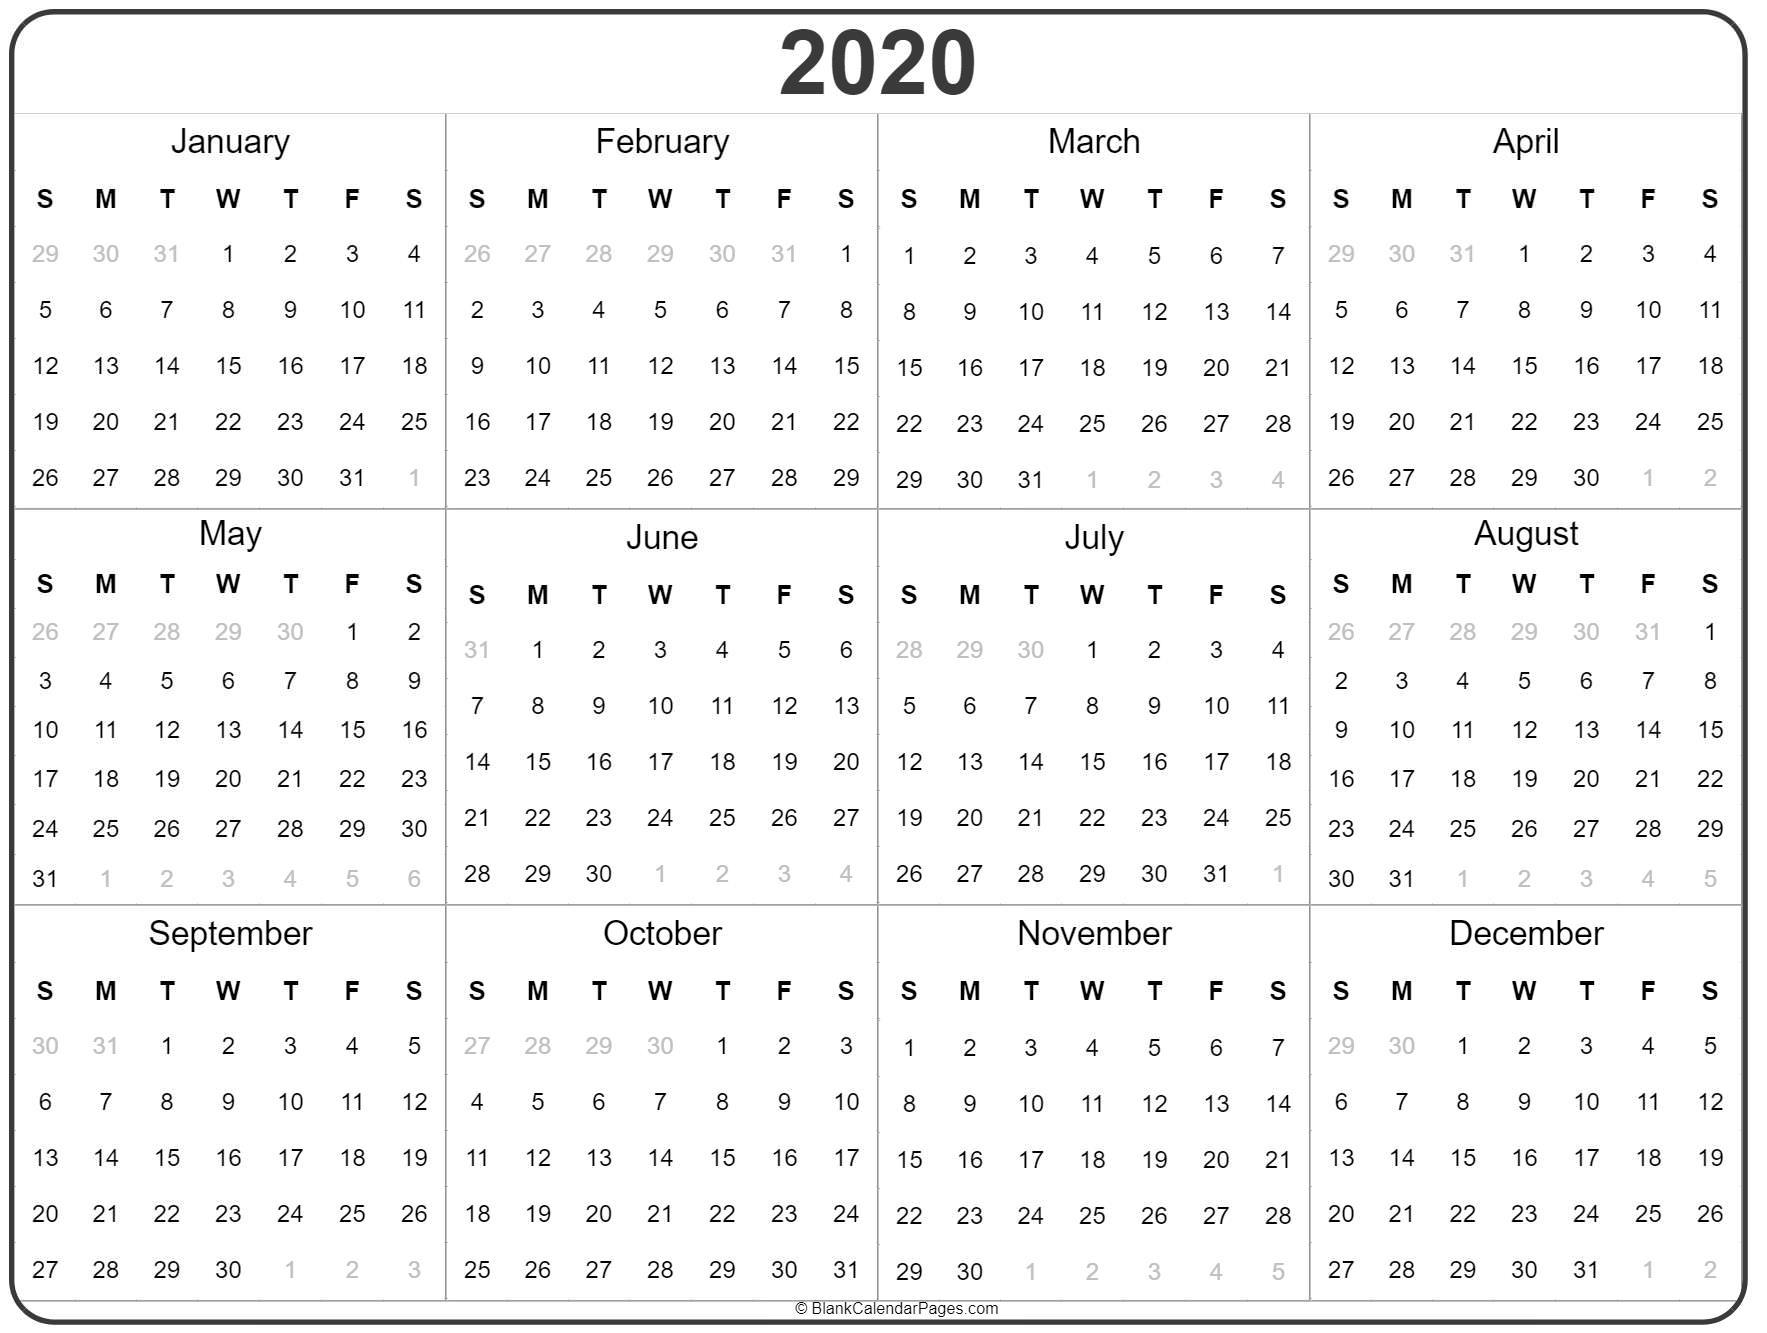 2020 Year Calendar | Yearly Printable